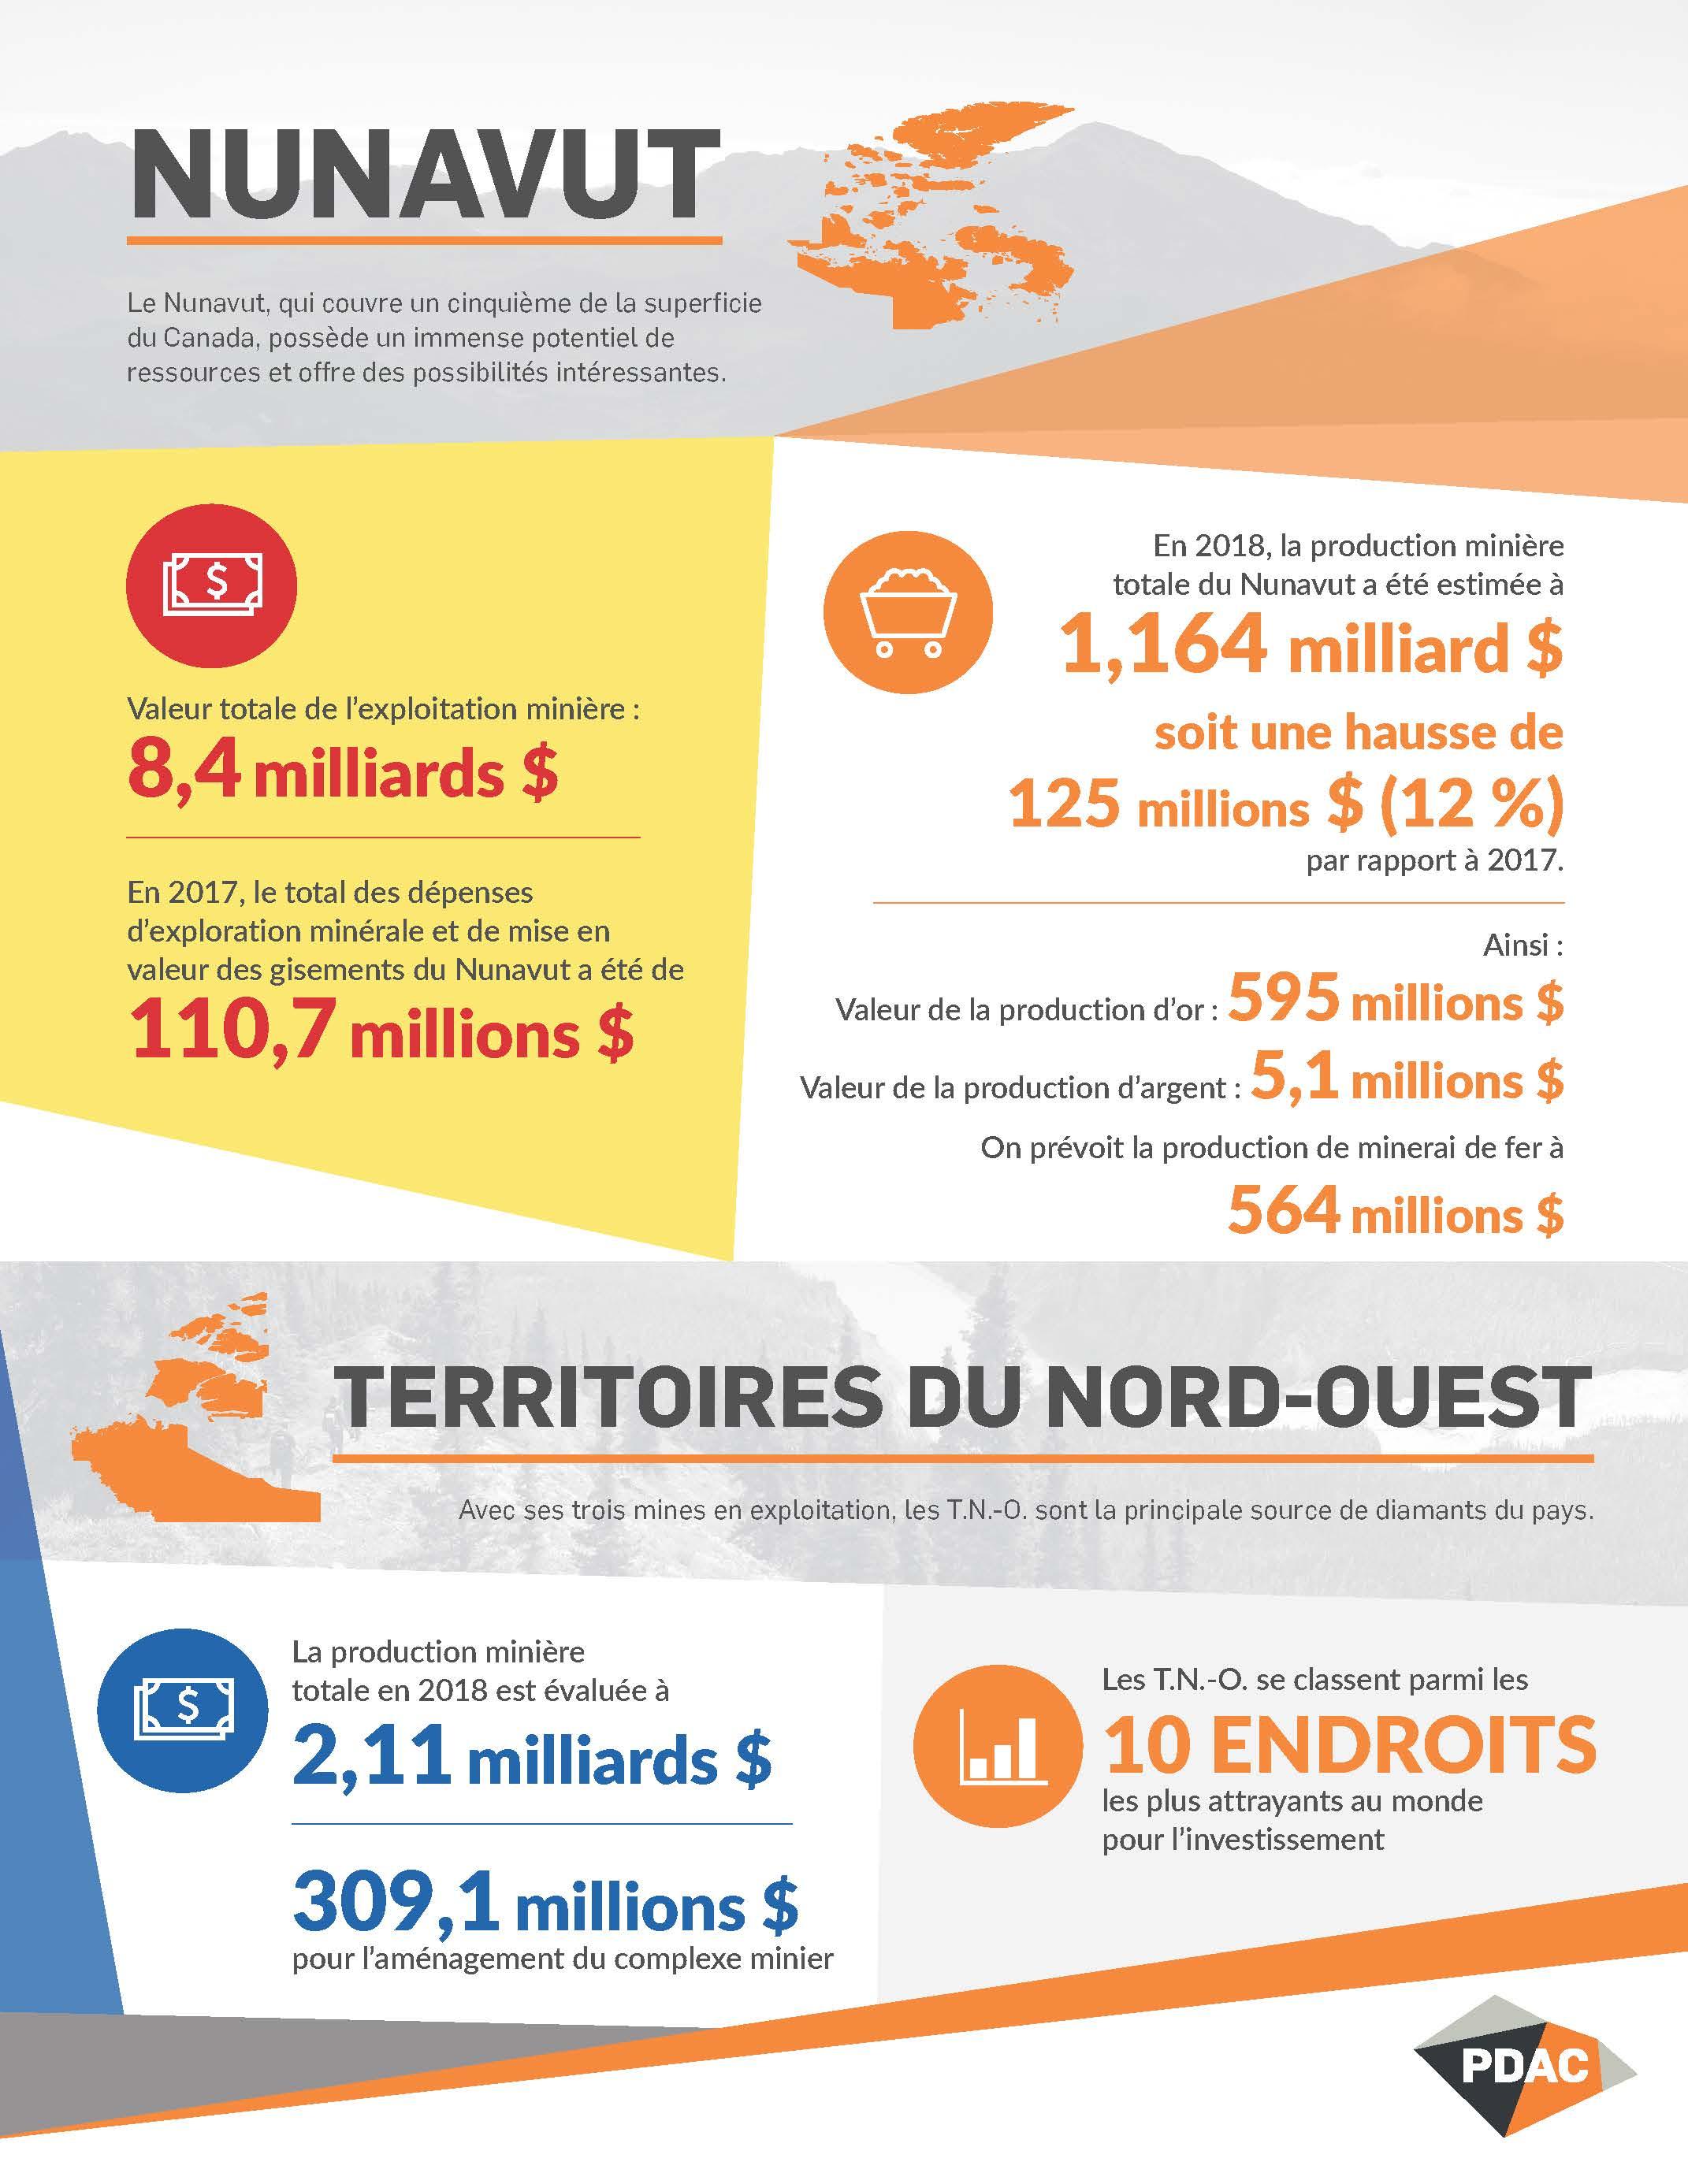 PDAC NunavutNWT_FR